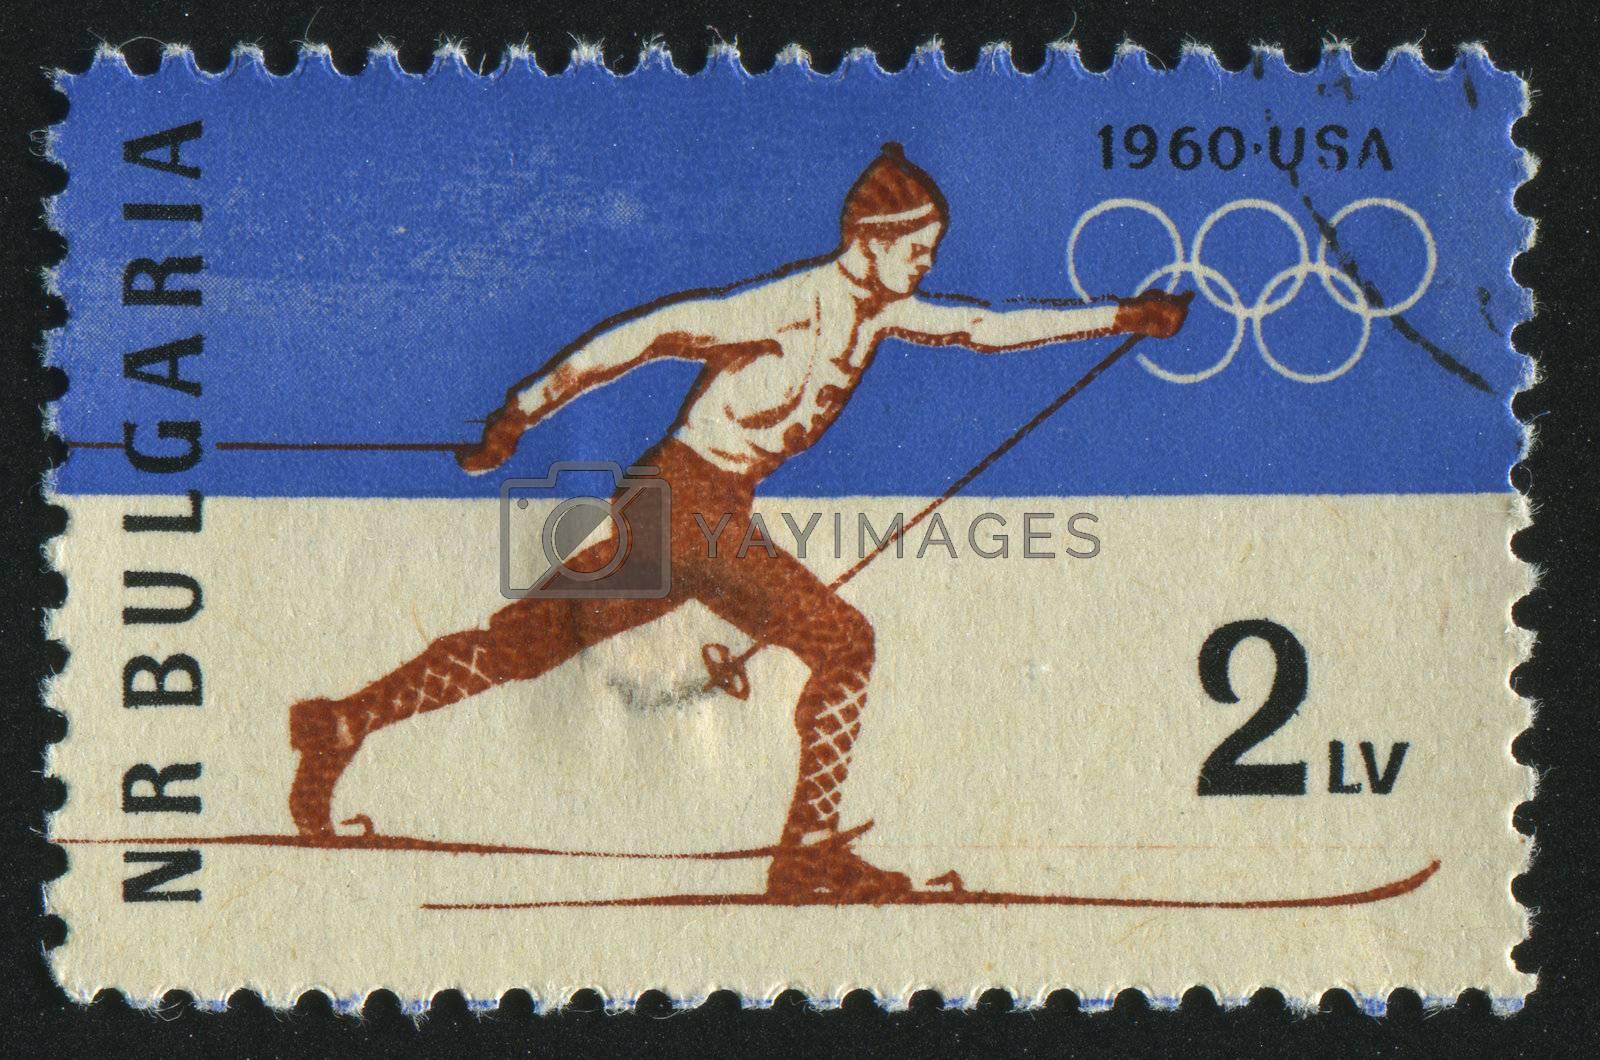 BULGARIA - CIRCA 1960: stamp printed by Bulgaria, shows cross-country skiing, circa 1960.